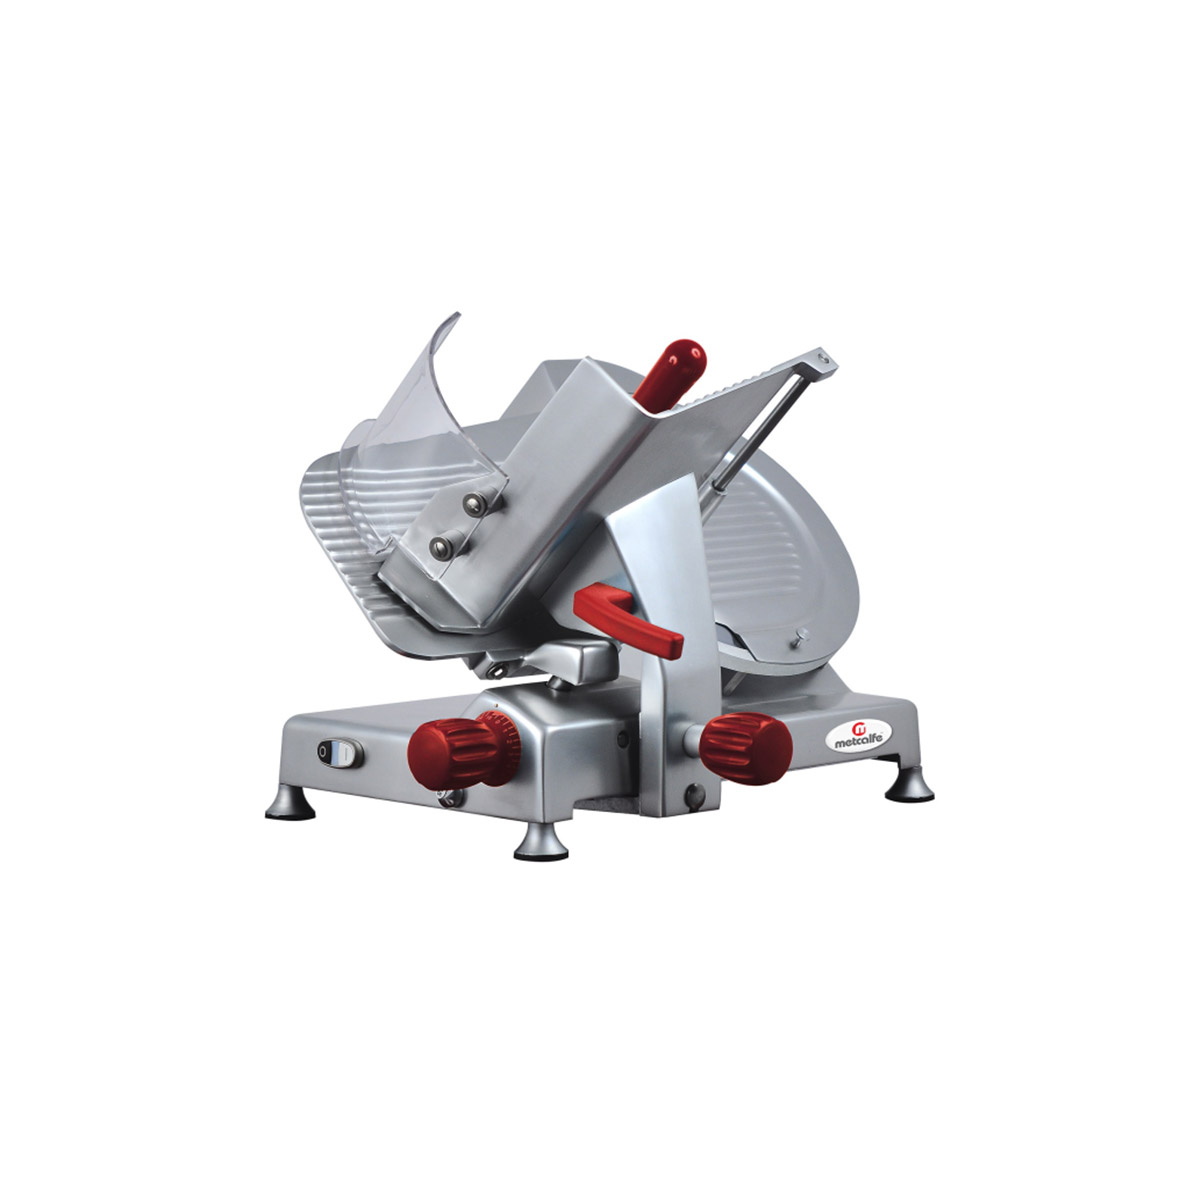 Metcalfe NS300HD Heavy Duty Slicer